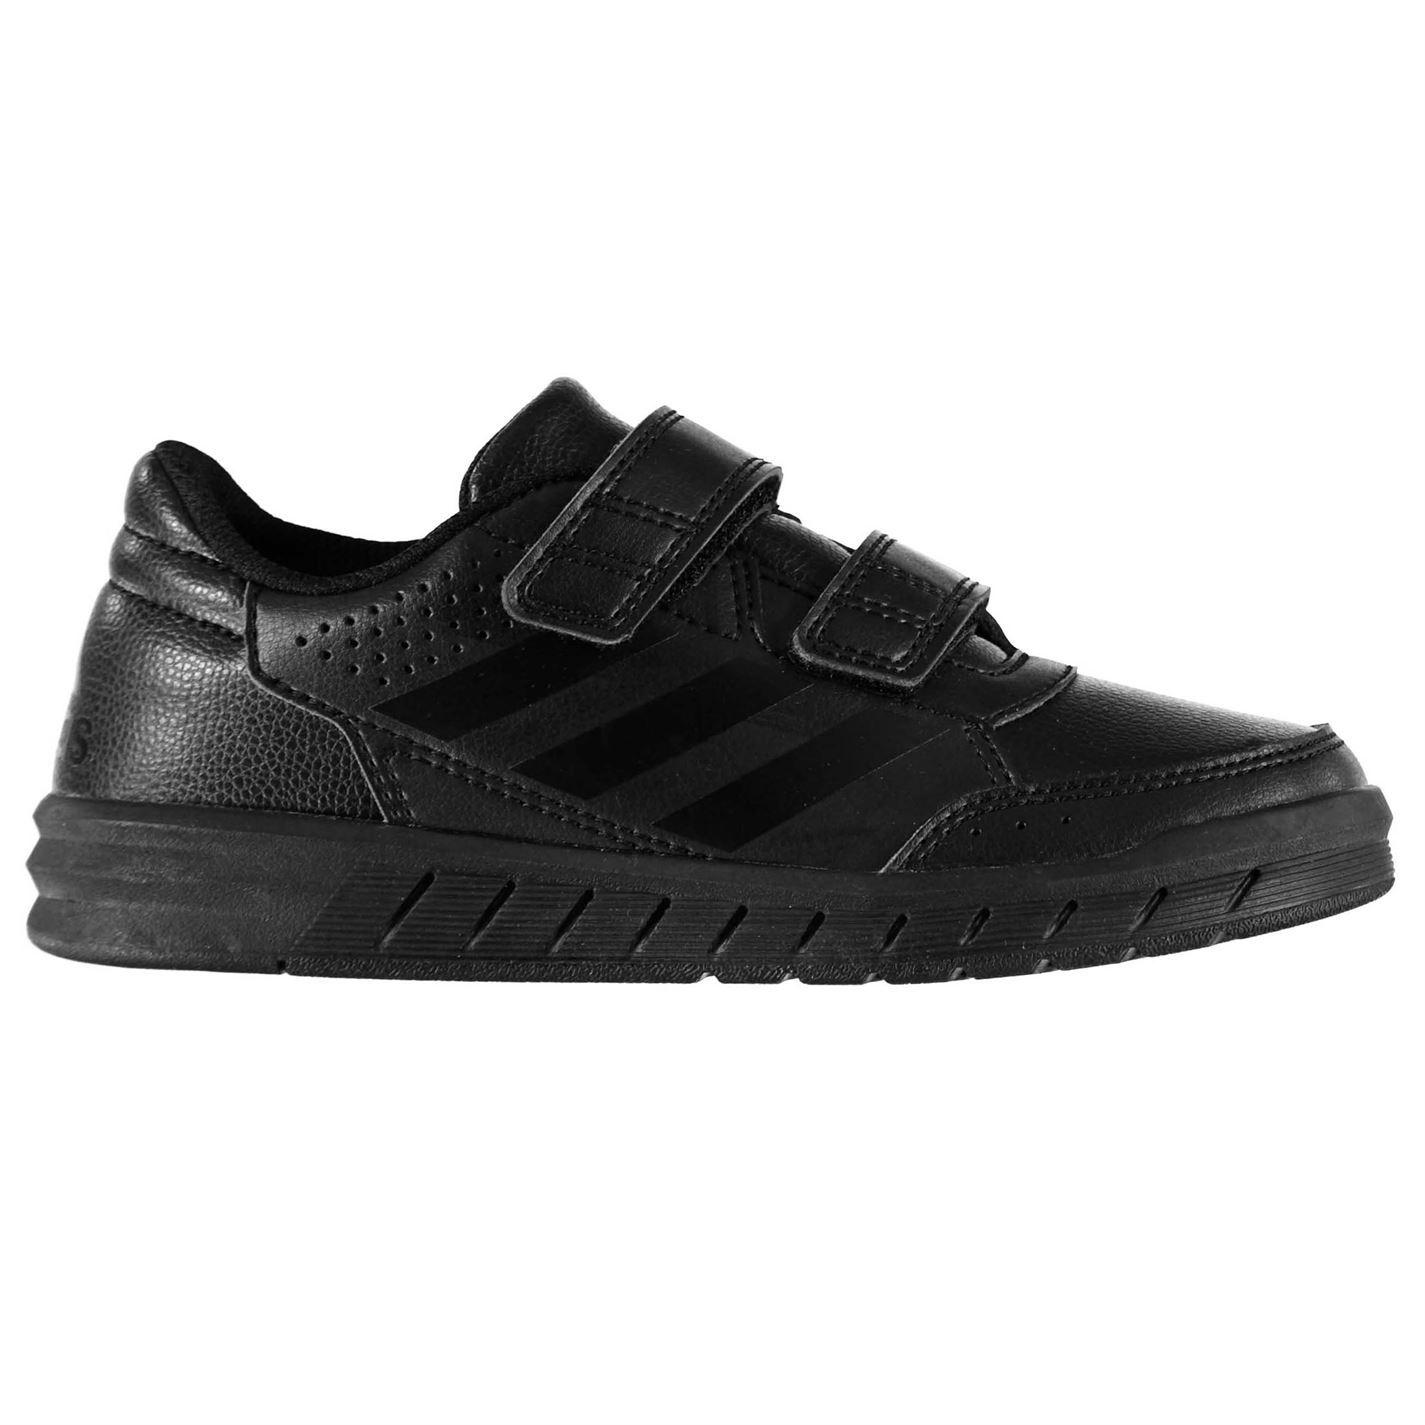 miniatura 4 - ADIDAS-alta-Sport-CF-Scarpe-da-ginnastica-bambino-ragazzo-calzature